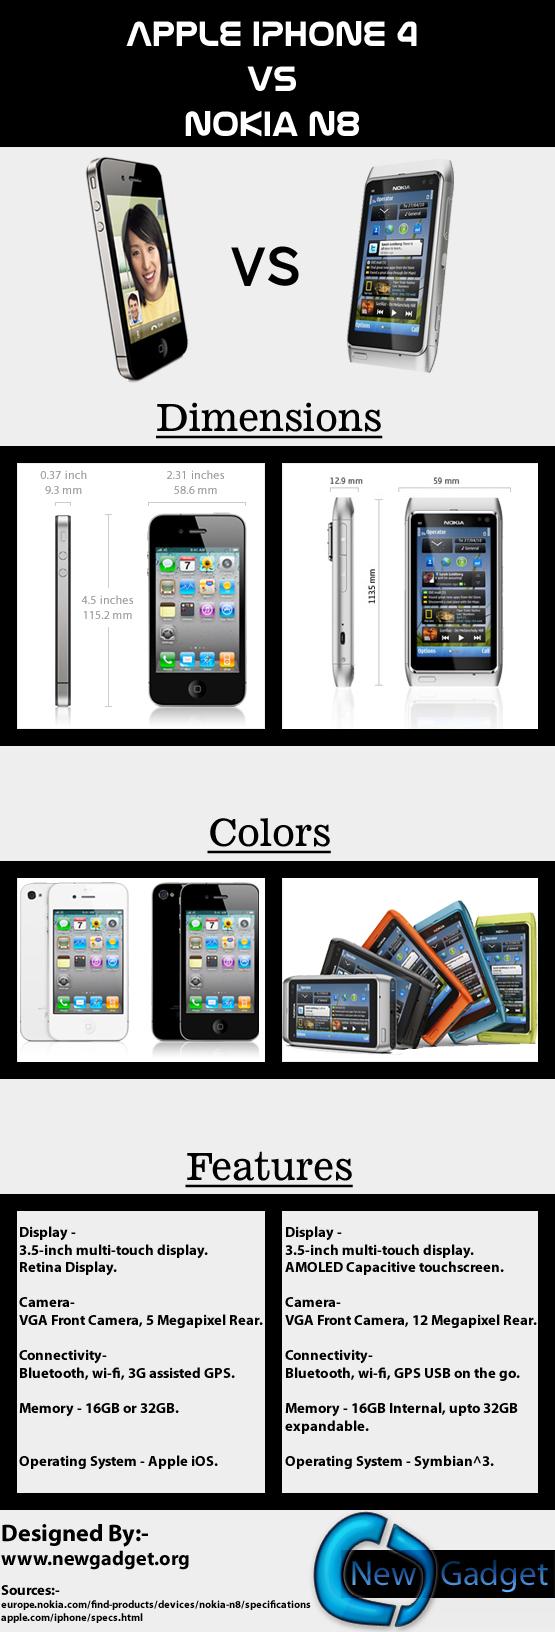 Apple iPhone 4 vs Nokia N8 Infographic